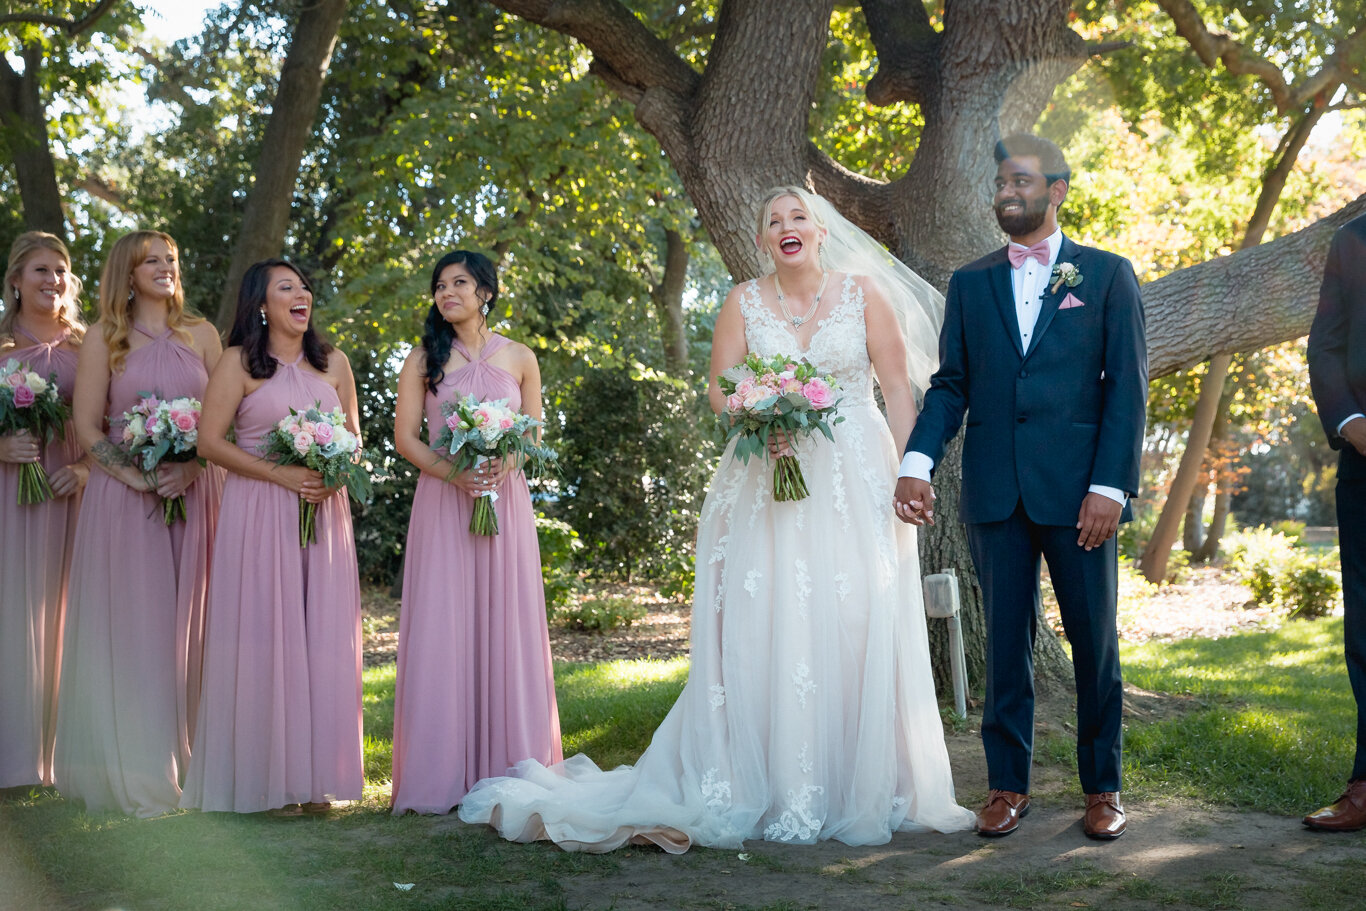 2019.08.24_Emily-Ashir-Wedding-at-the-Maples-5802.jpg